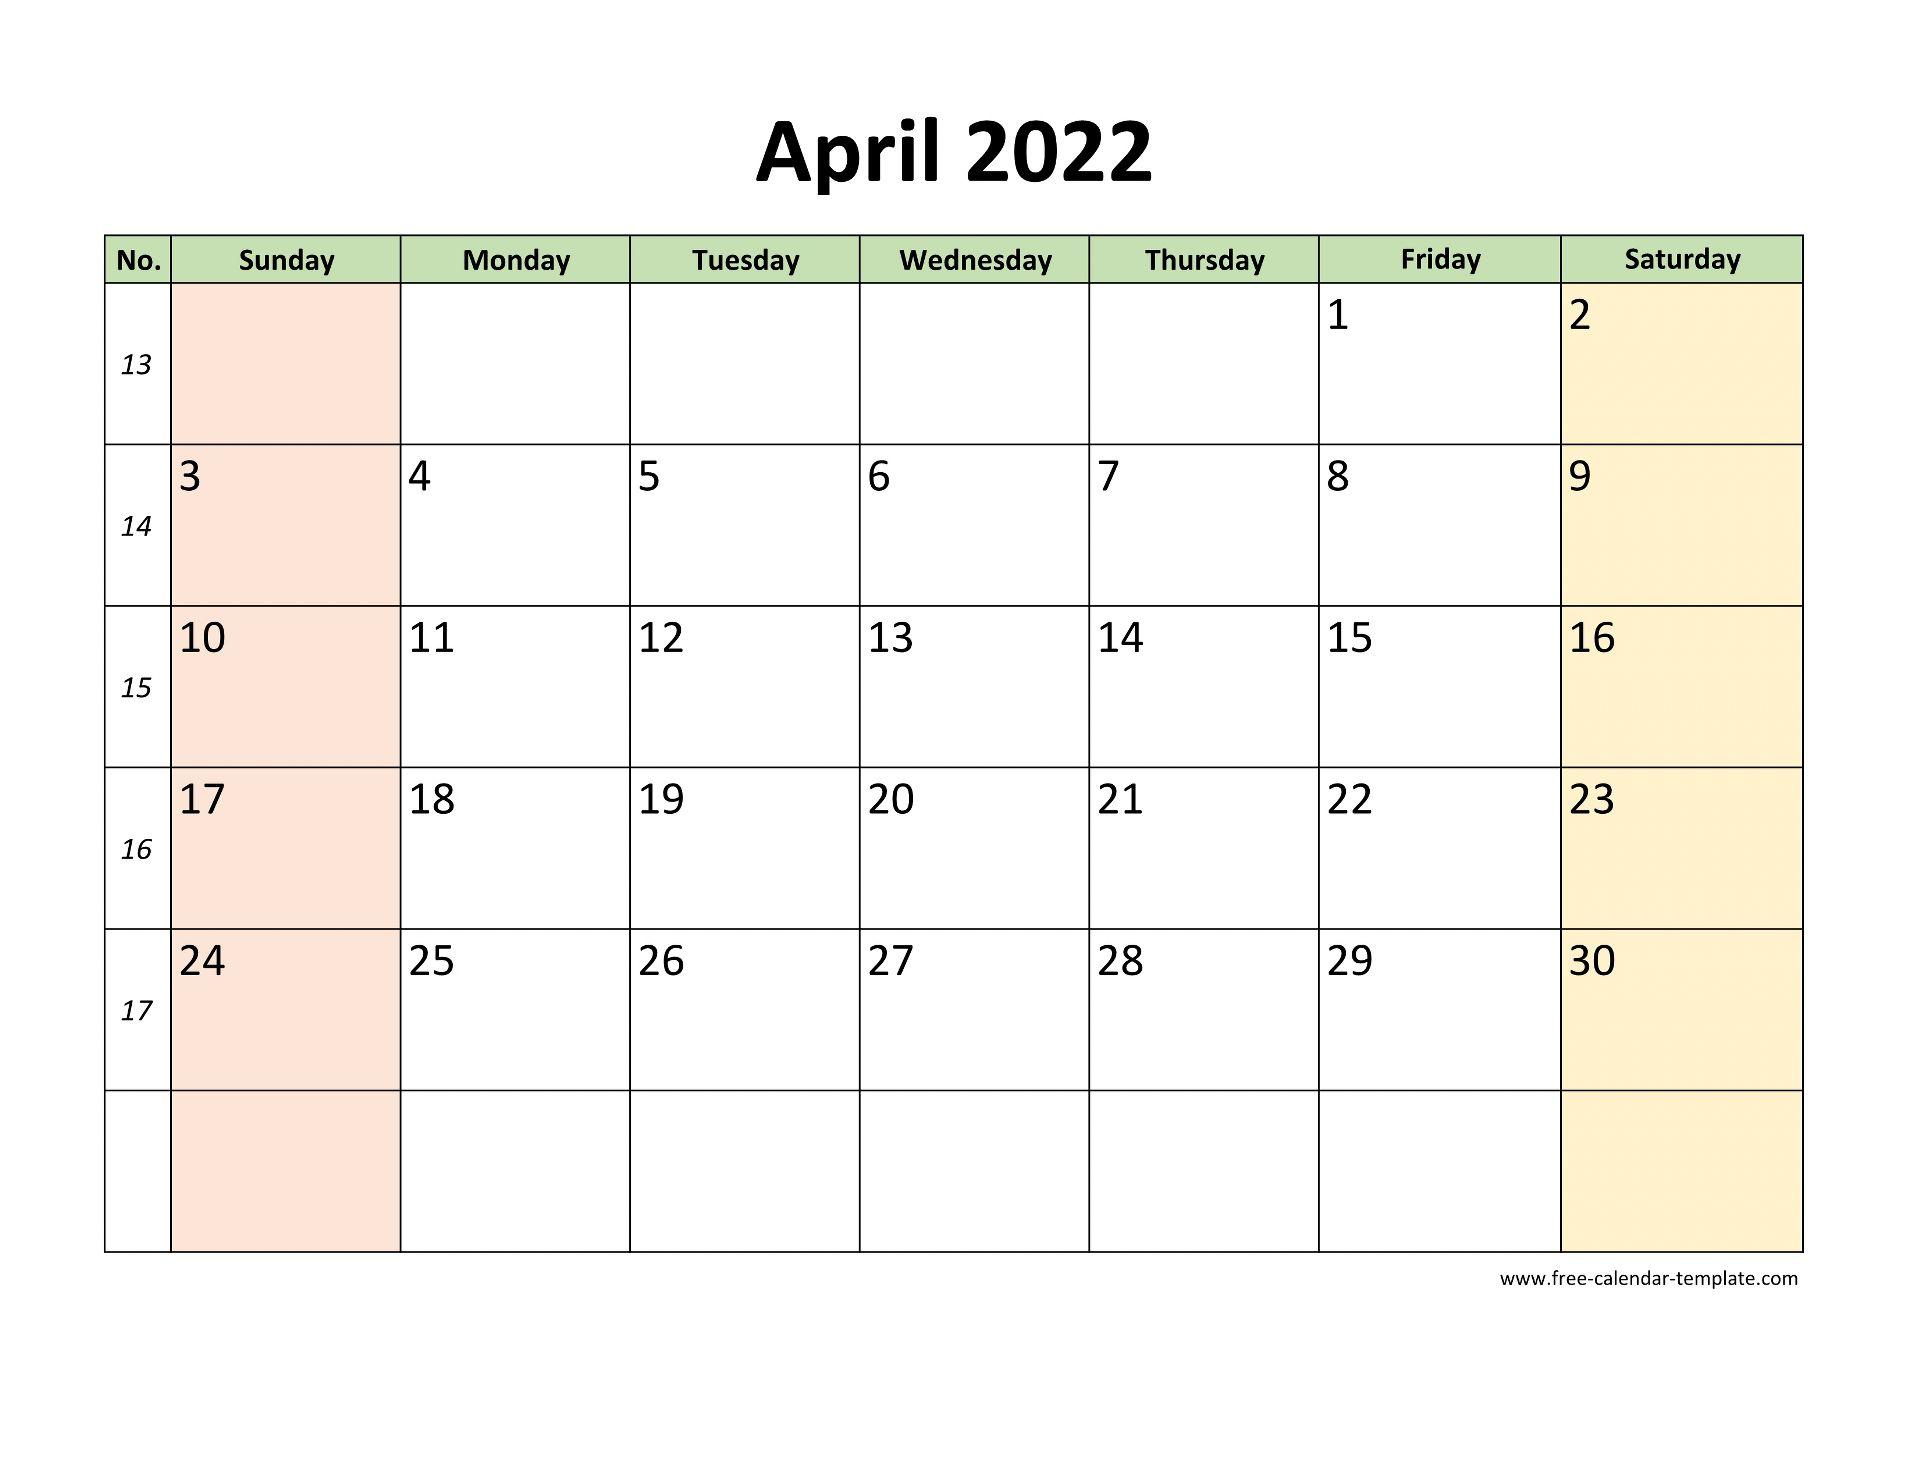 April 2022 Calendar Template.April 2022 Calendar Printable With Coloring On Weekend Horizontal Free Calendar Template Com